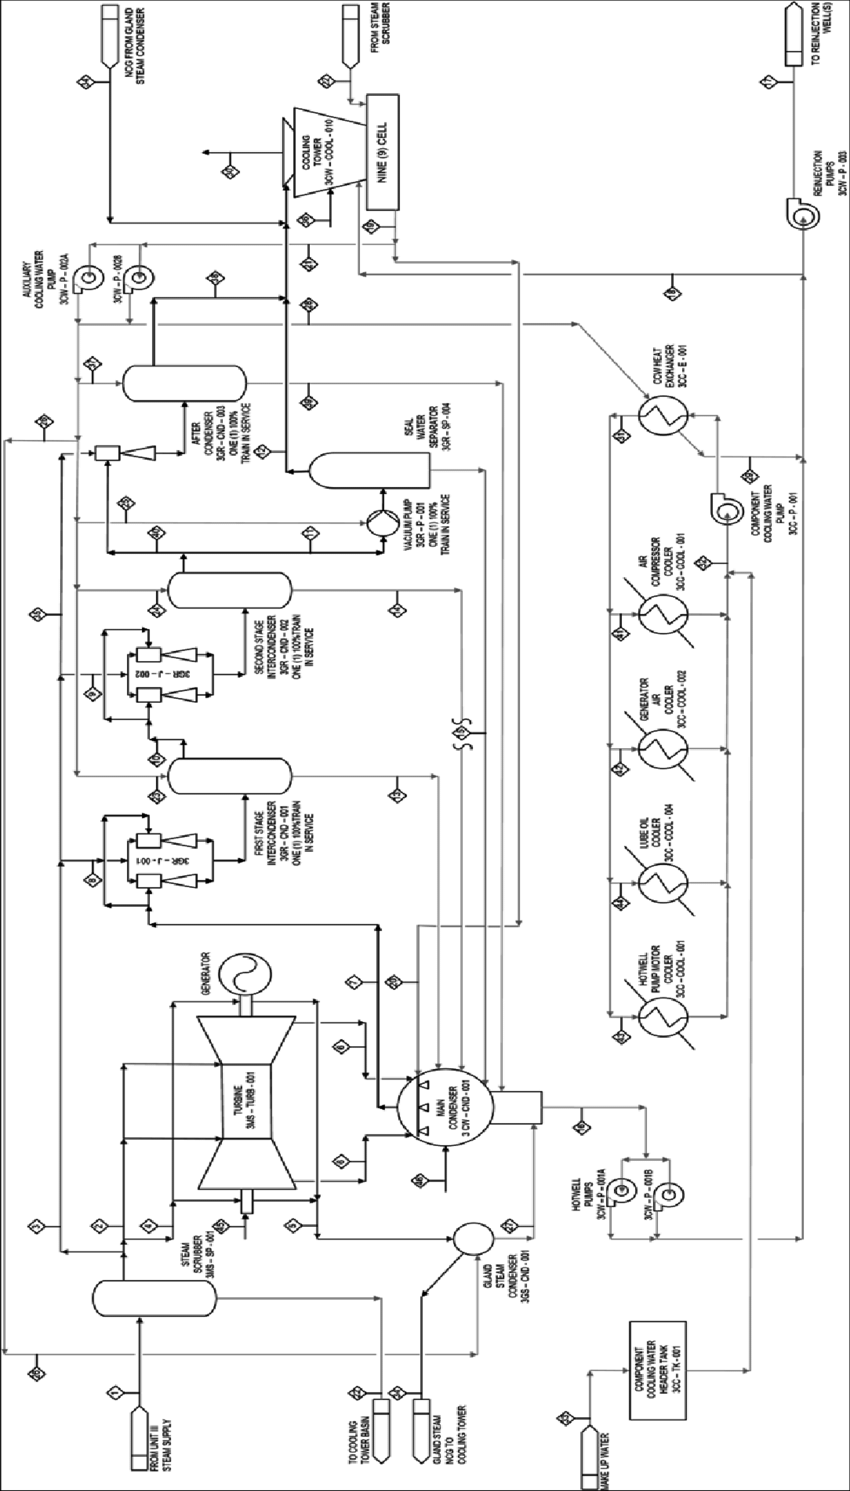 medium resolution of process flow diagram pfd of darajat unit iii download scientific process flow diagram symbols